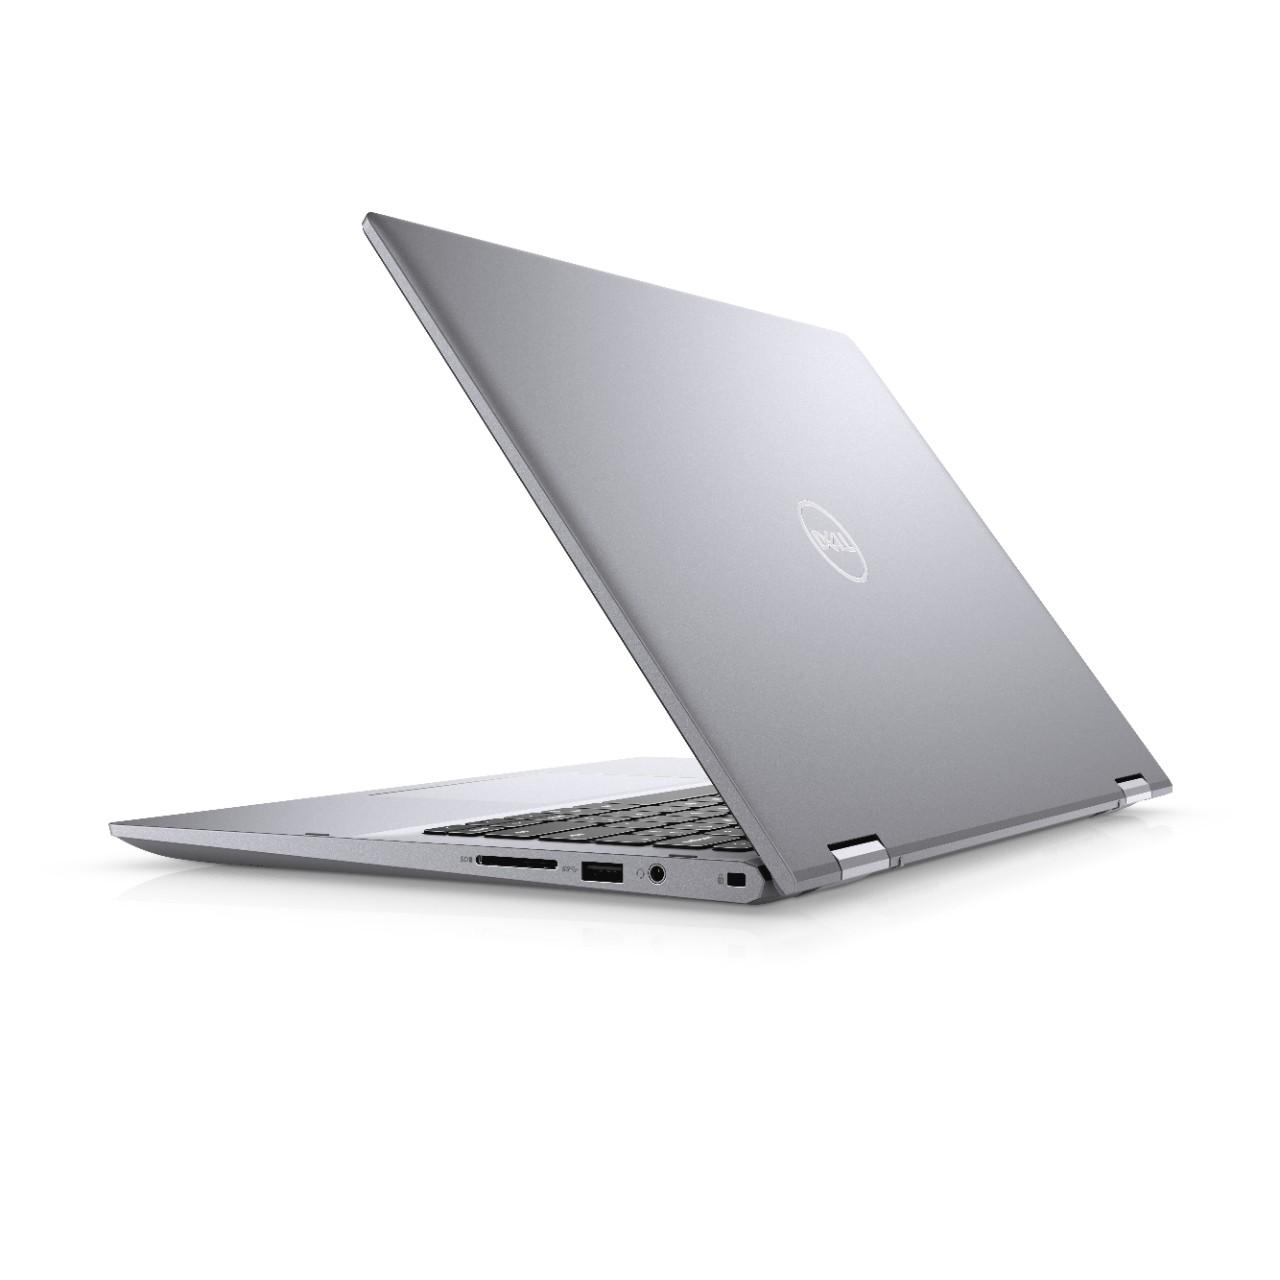 Dell Inspiron 5406 14'' FHD 2v1 Touch i7-1165G7/8GB/512GB/MX330/FPR/HDMI/USB-C/W10Home/2RNBD/Stříbrný - TN-5406-N2-712S